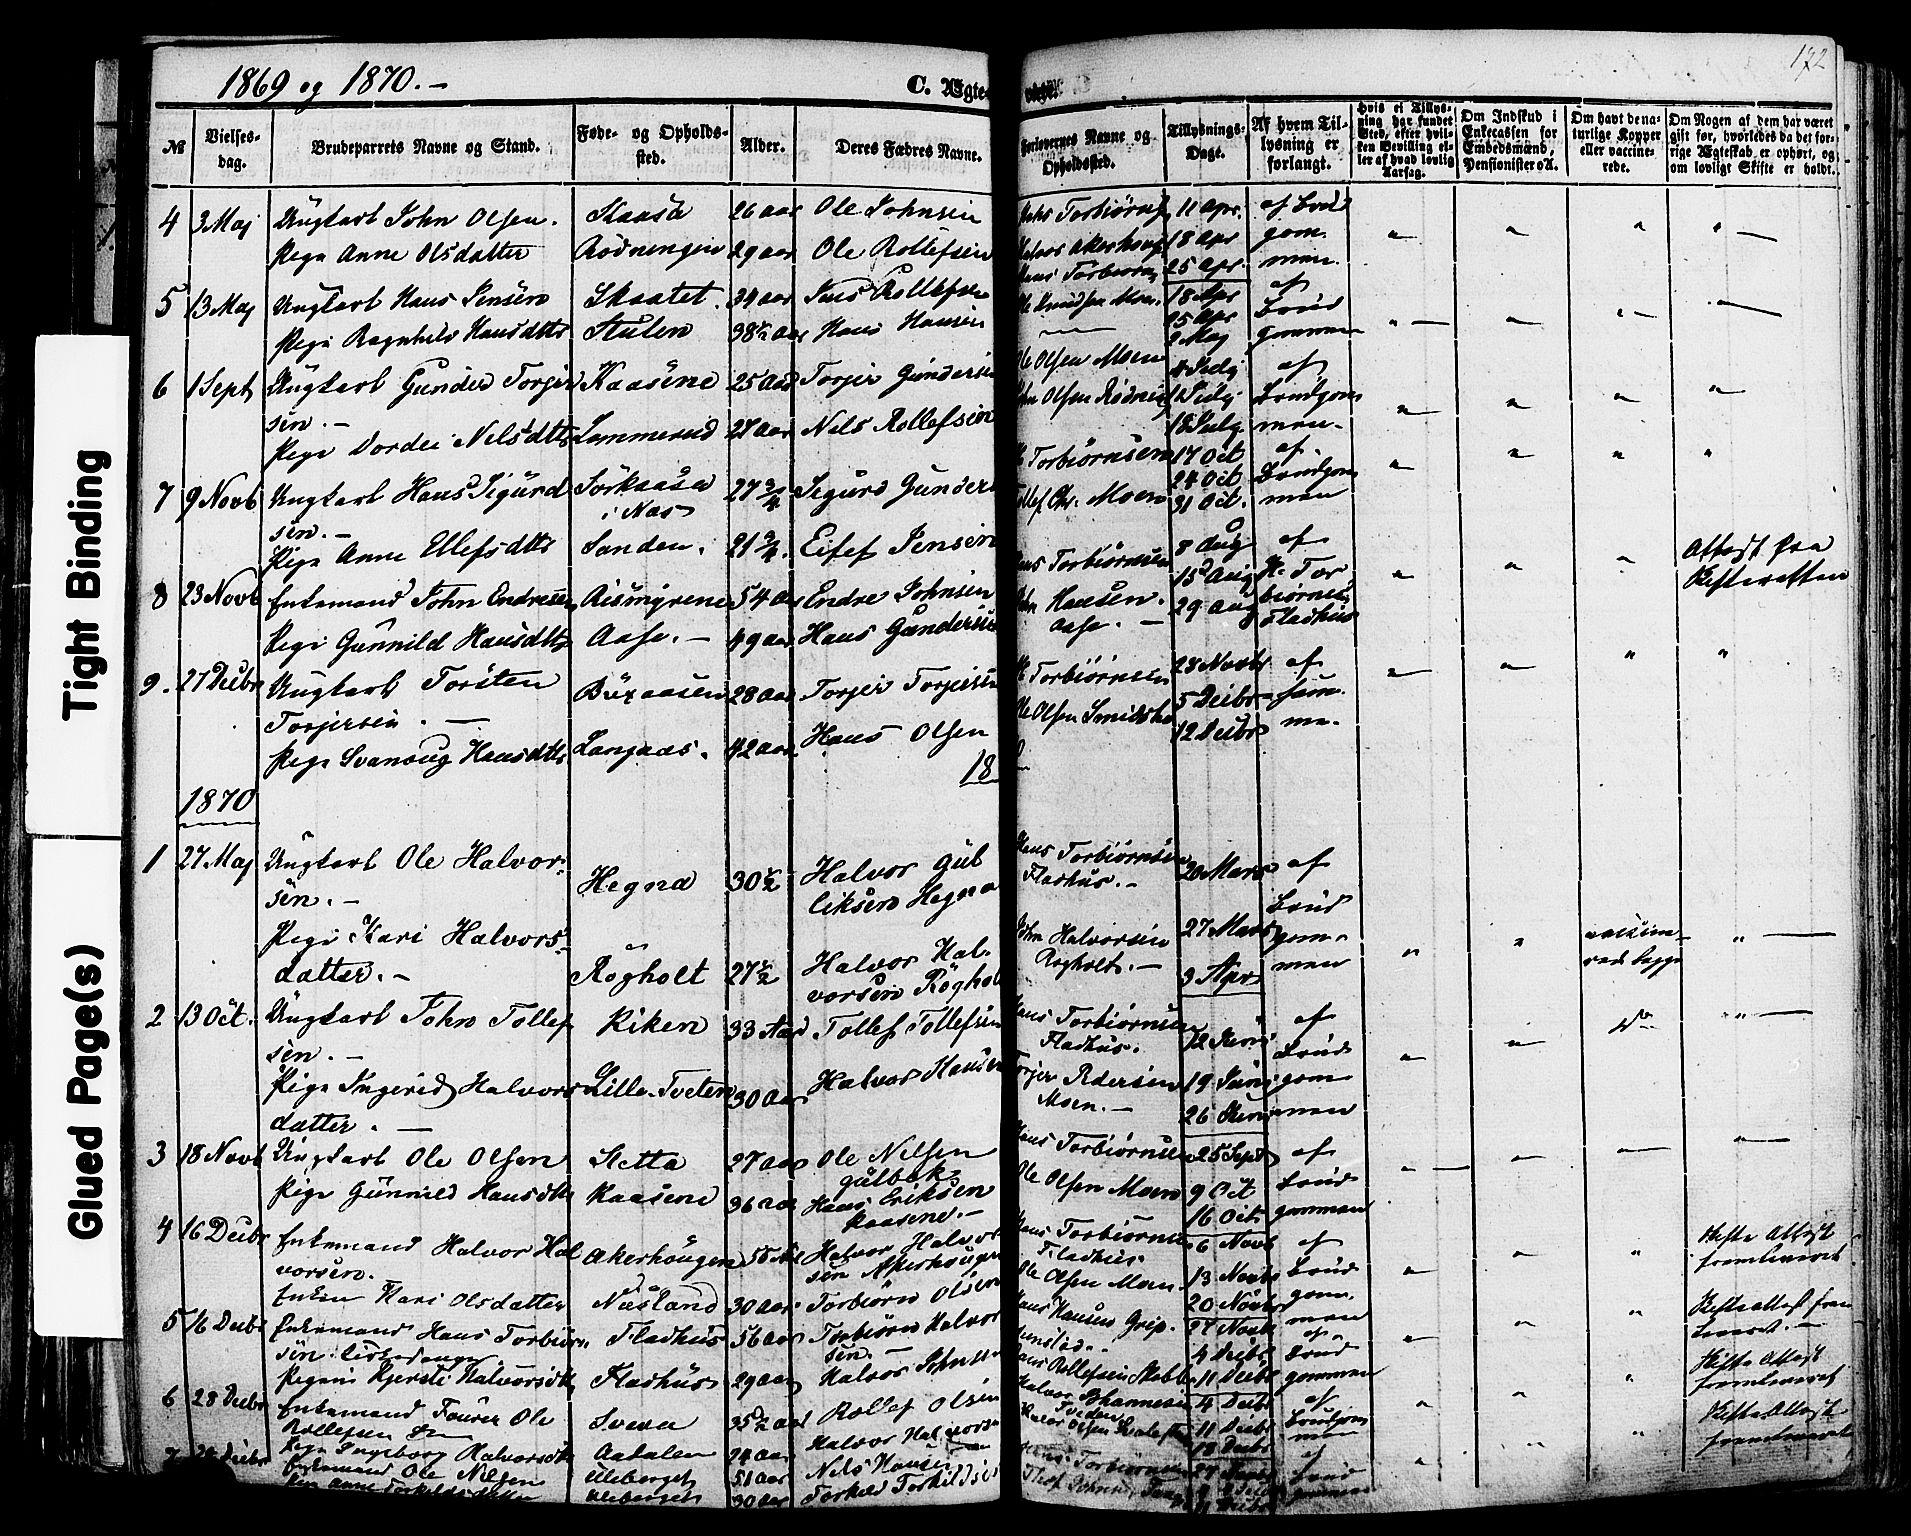 SAKO, Sauherad kirkebøker, F/Fa/L0007: Ministerialbok nr. I 7, 1851-1873, s. 172